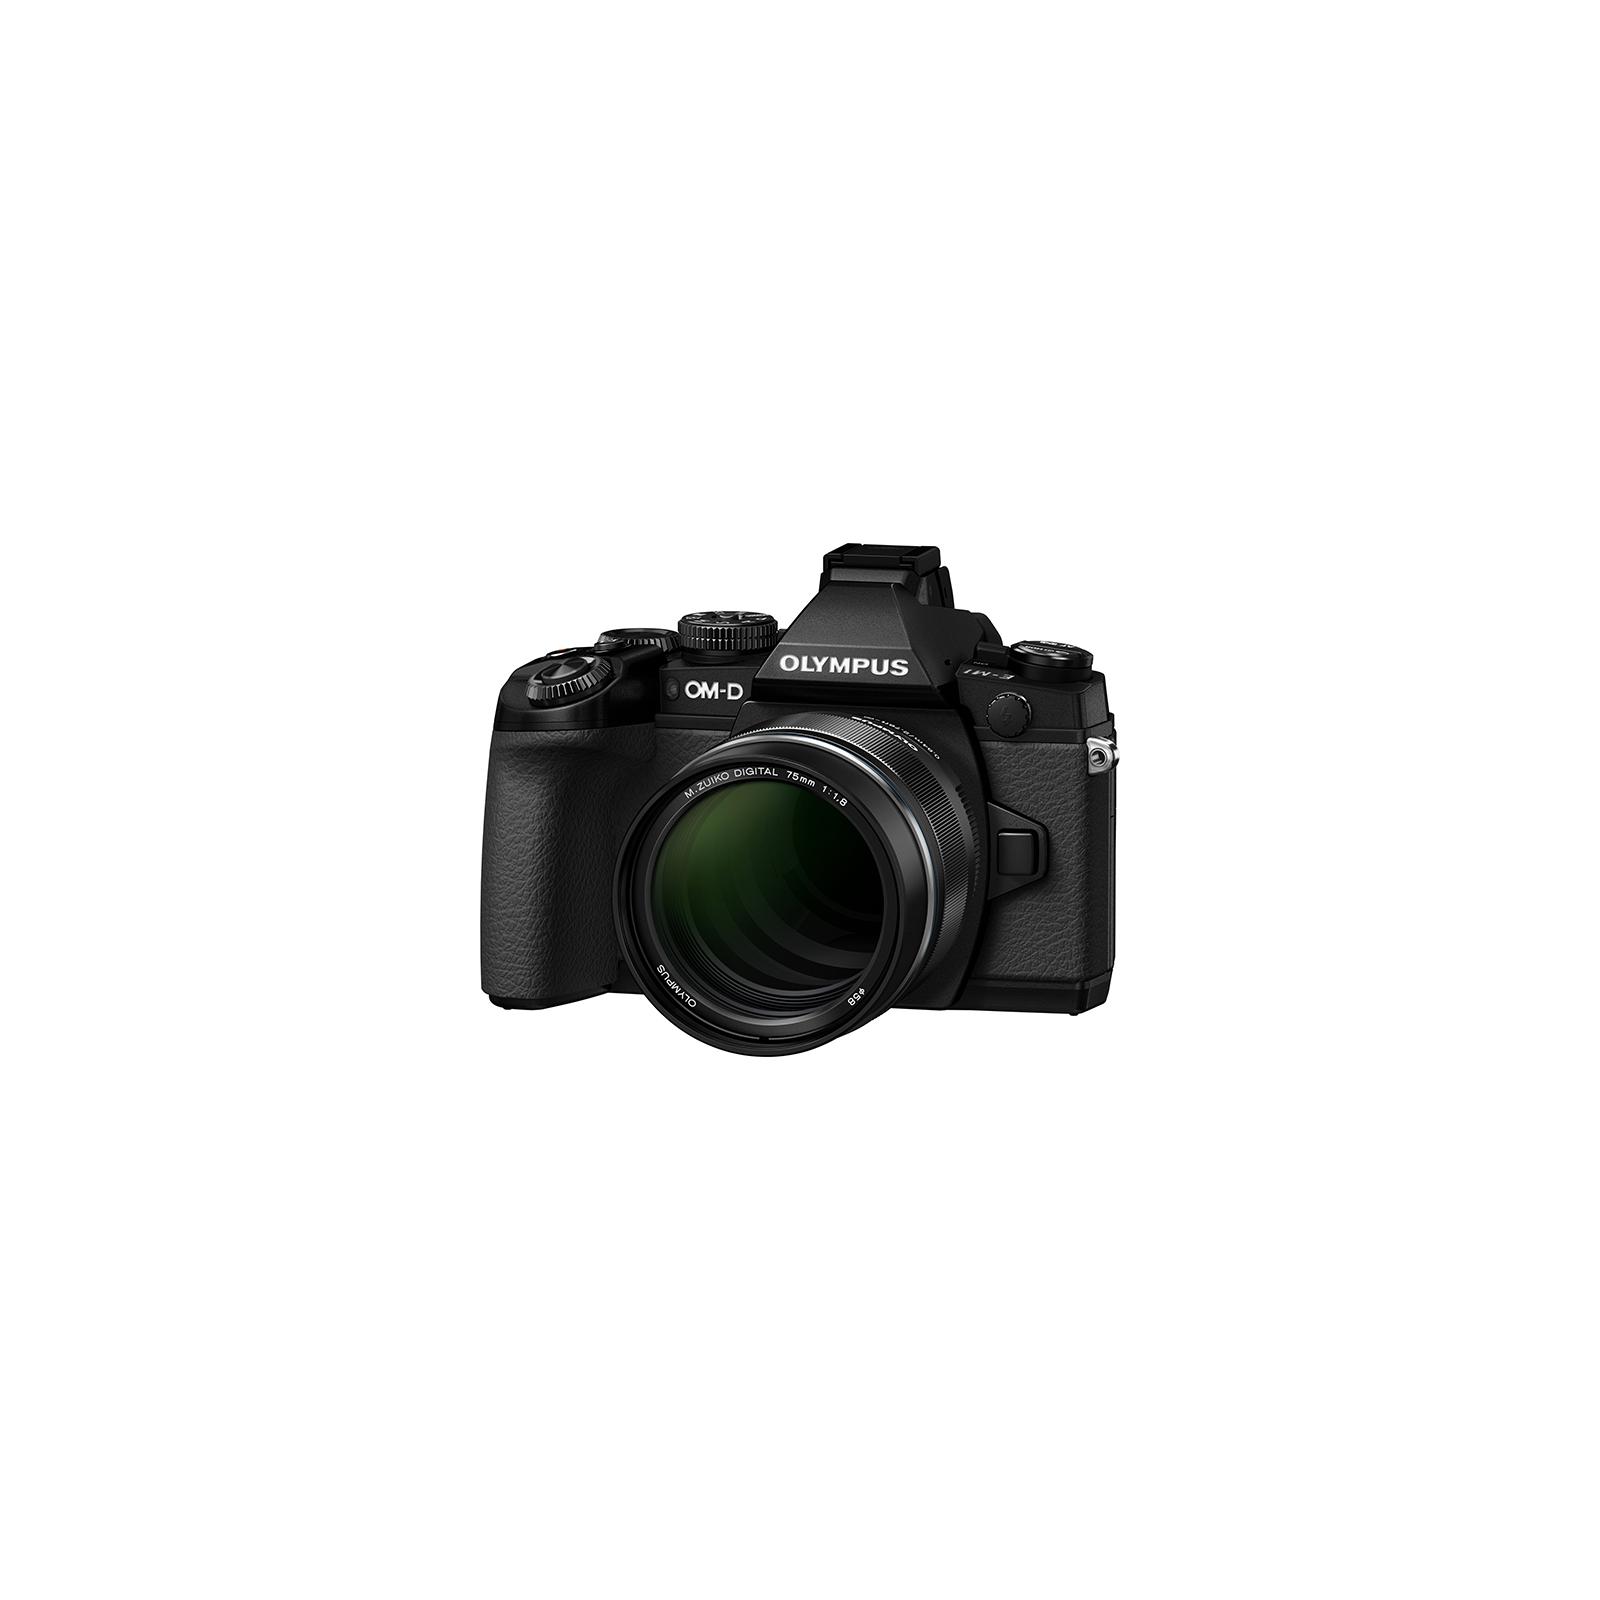 Объектив OLYMPUS ET-M7518 75mm 1:1.8 Black (V311040BE000) изображение 3